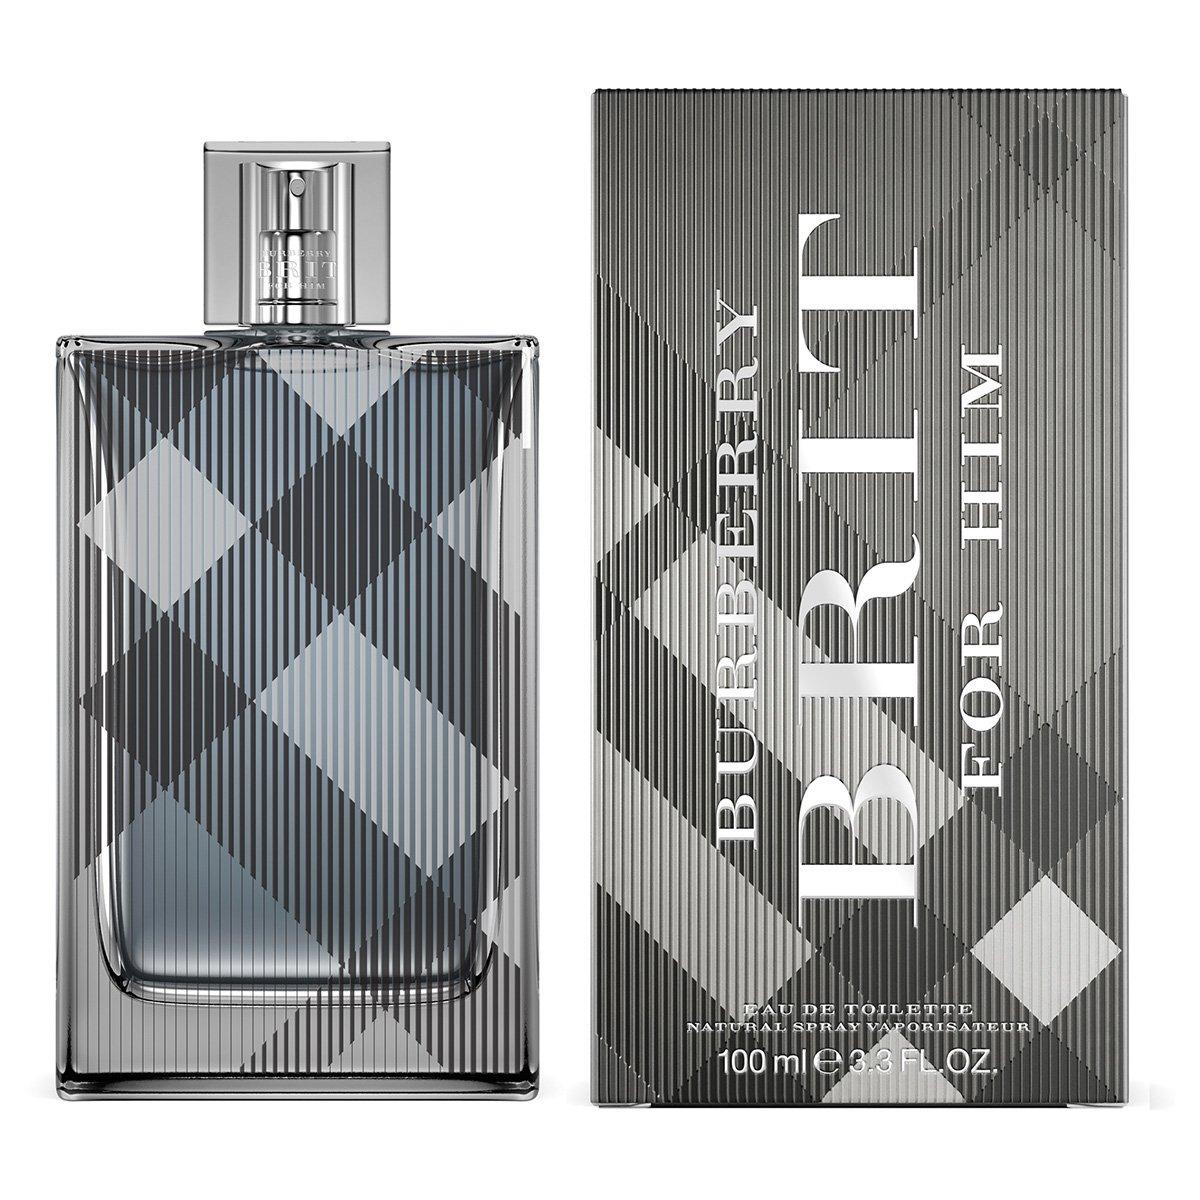 842501cb103 Perfume Brit For Him Masculino Burberry Eau de Toilette 100ml - Compre  Agora